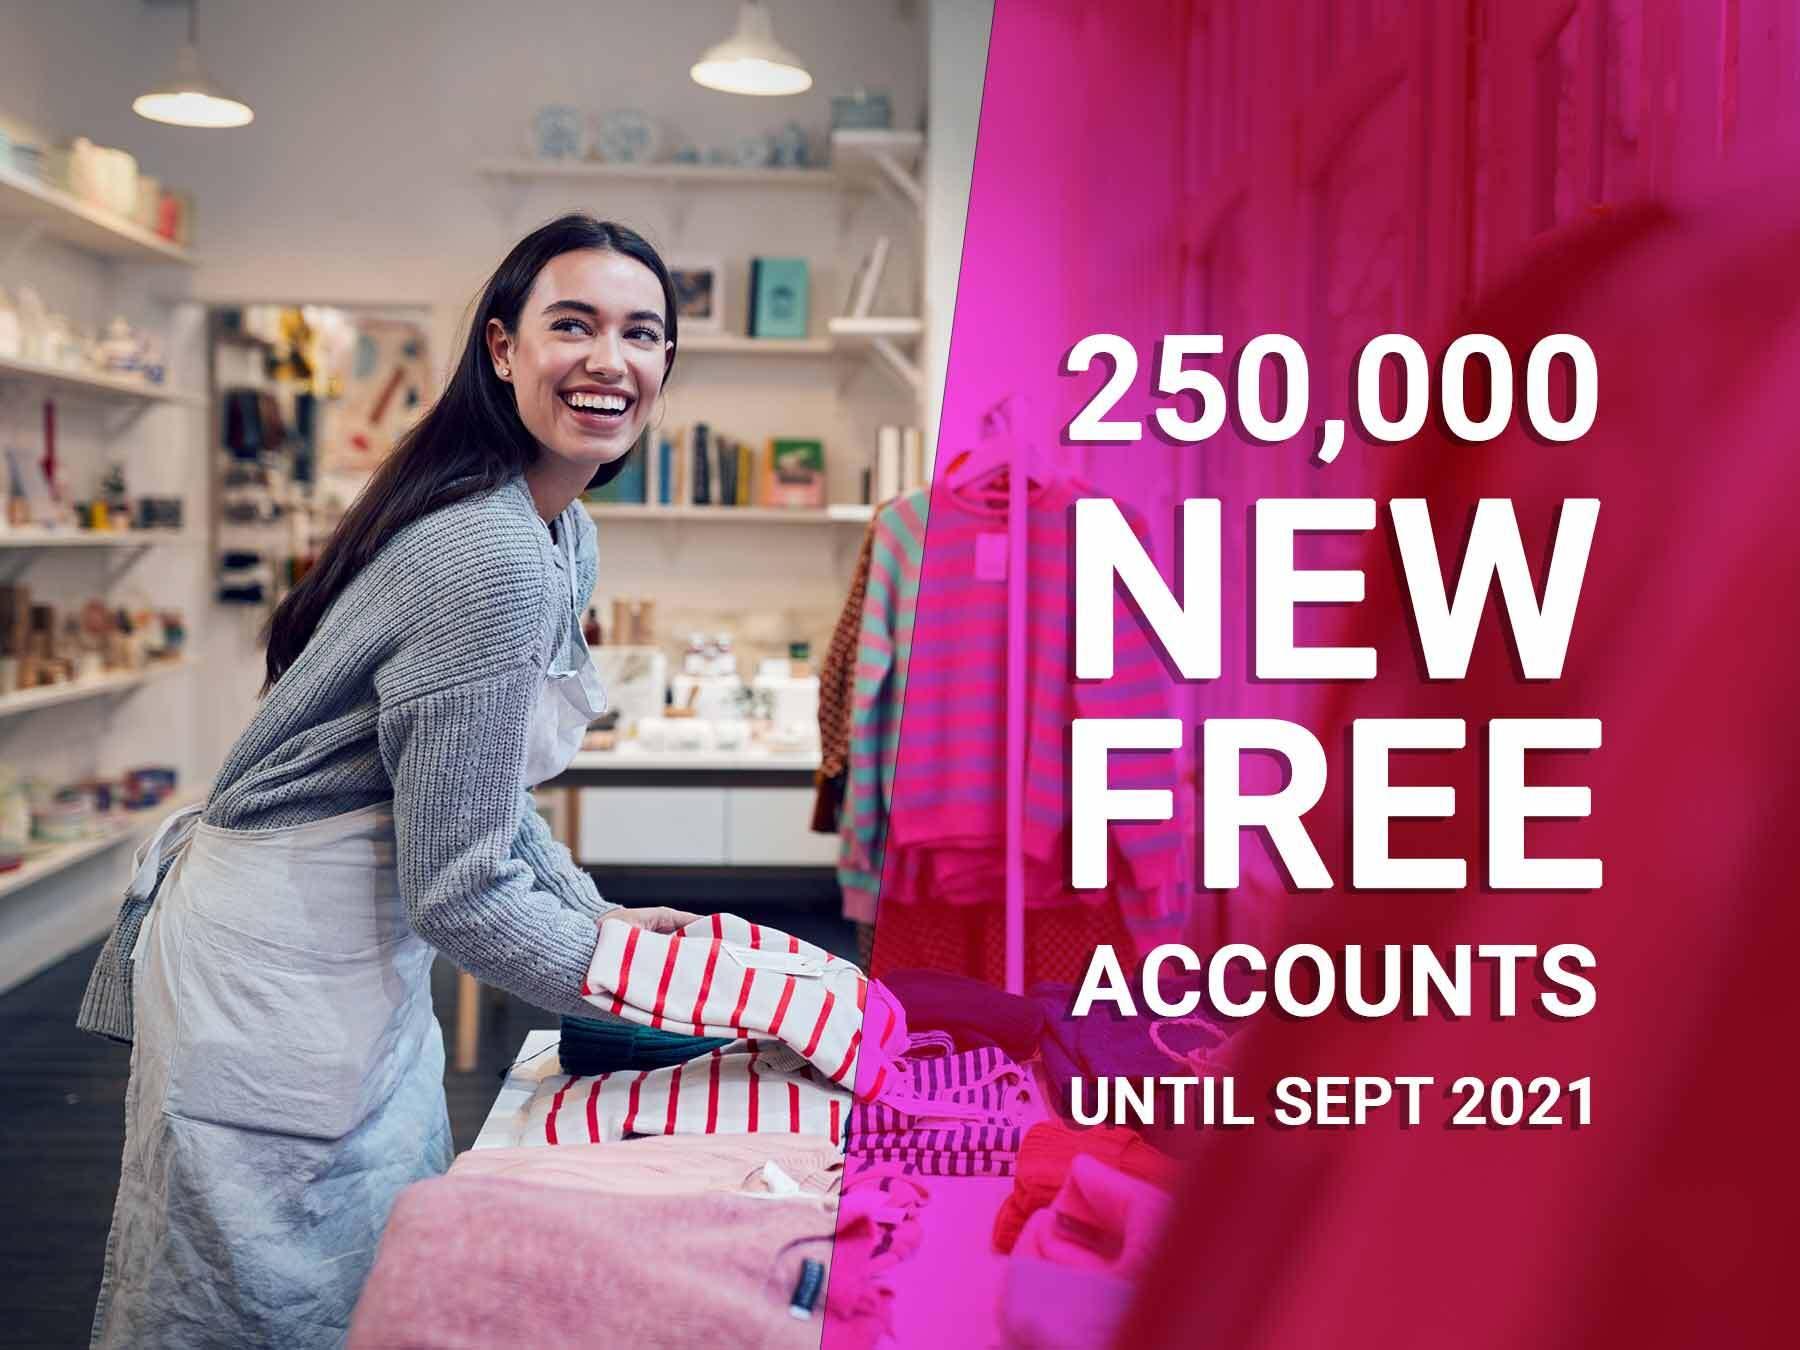 rankingCoach Launches 250,000 More rankingCoach FREE Accounts